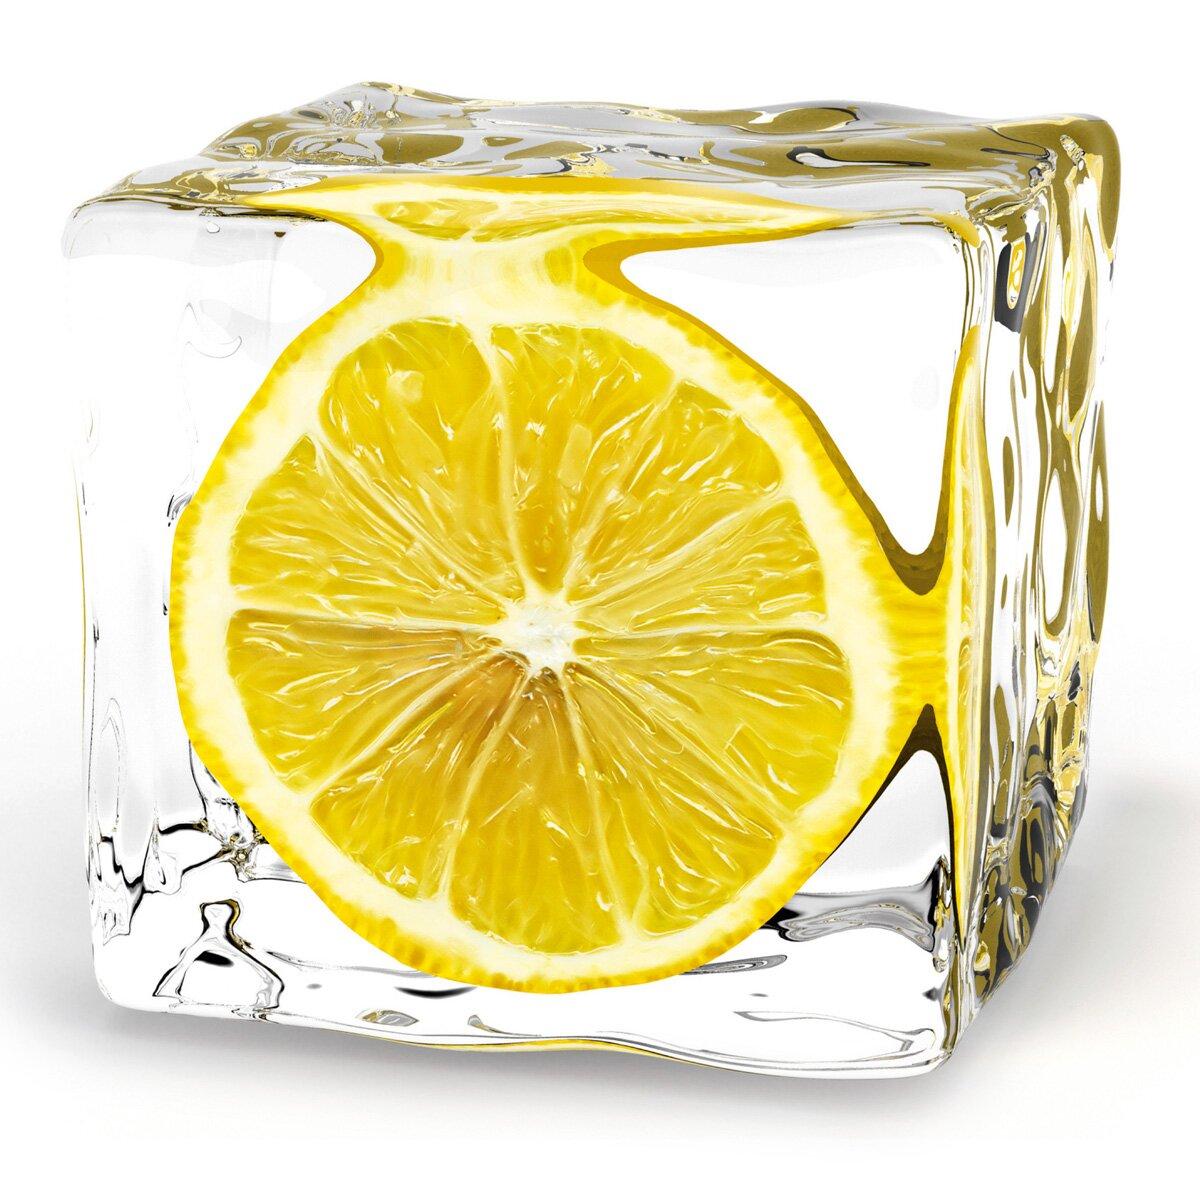 Platin art deco glass iced lemon photographic print reviews wayfair - Deco glace ...